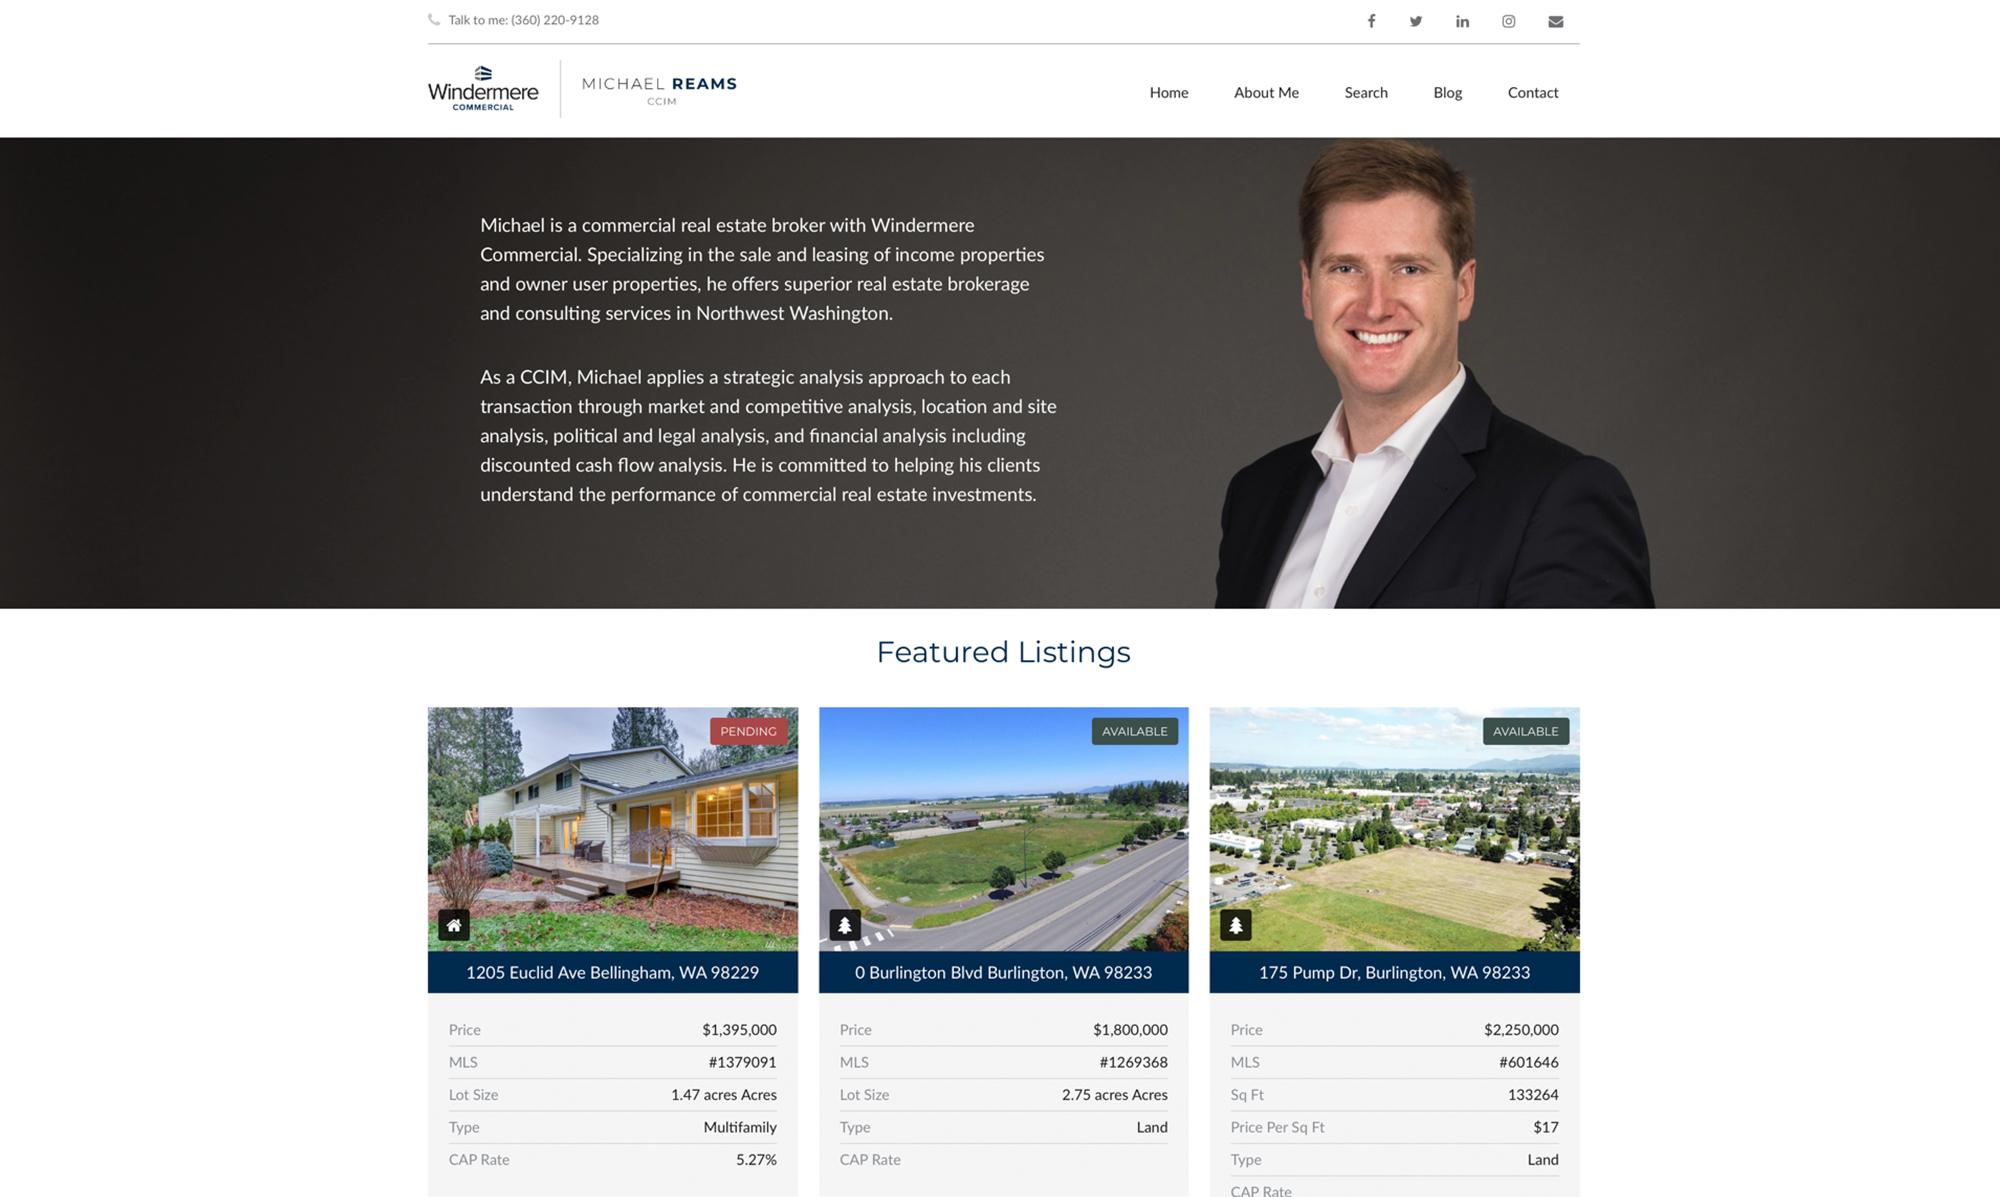 Michael Reams Real Estate Website Design & Development